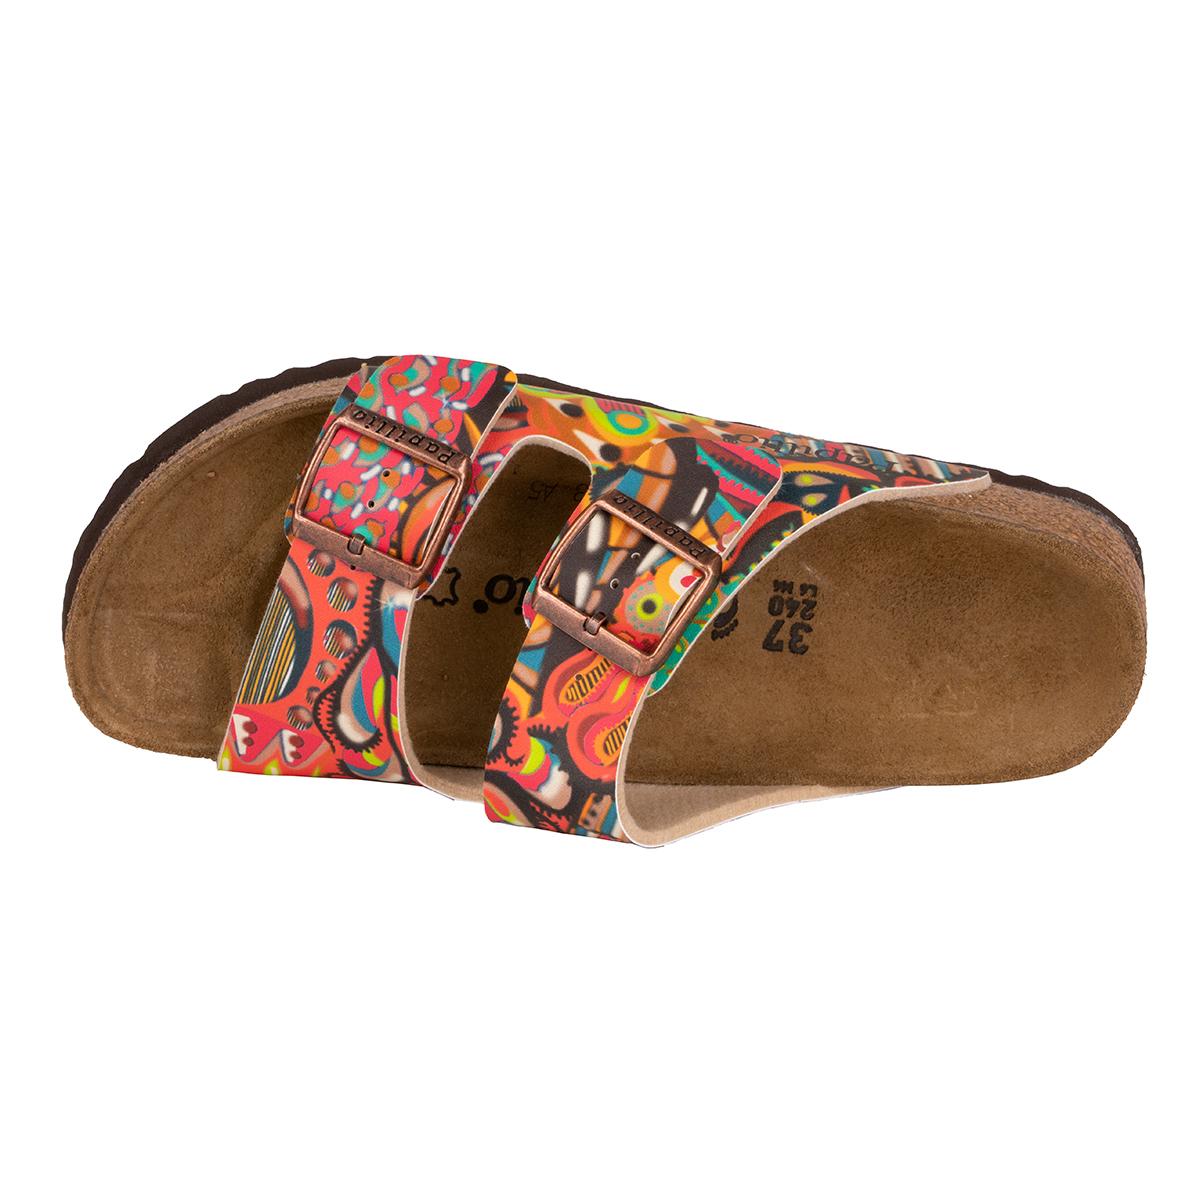 Birkenstock-Arizona-Sandals thumbnail 4